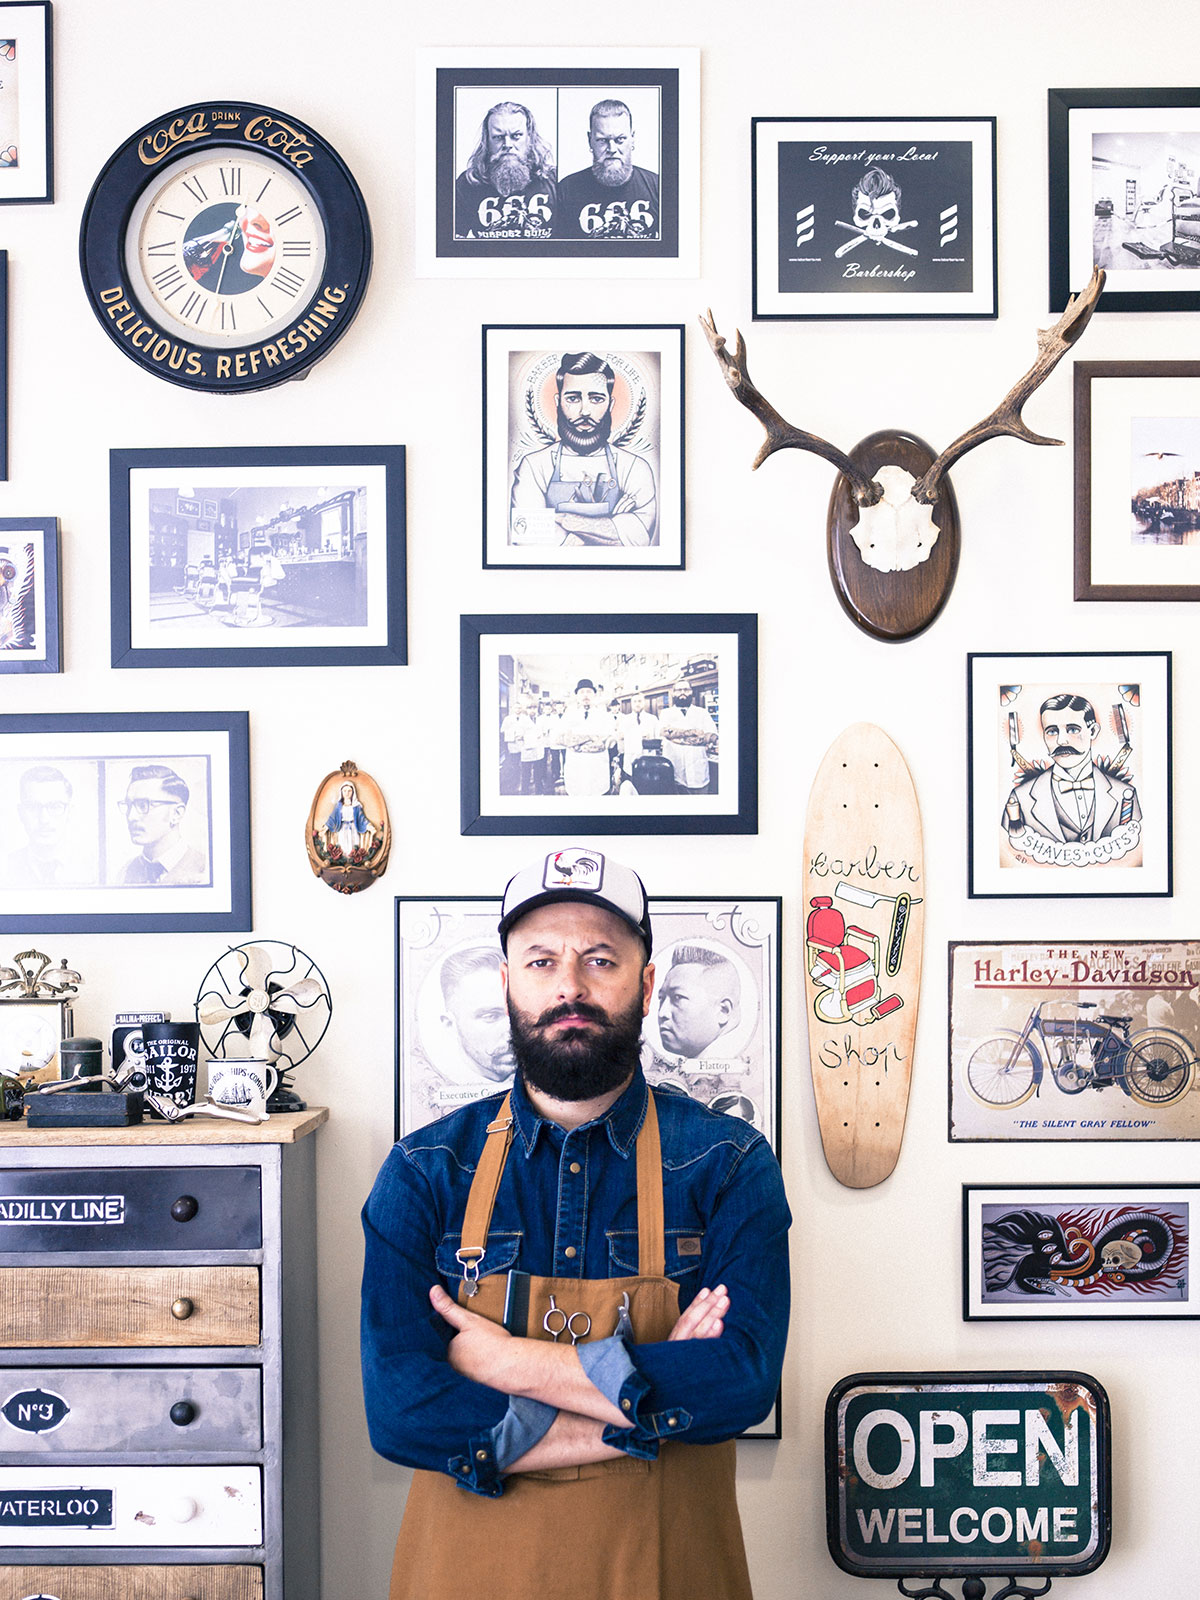 Basilio Barber Shop